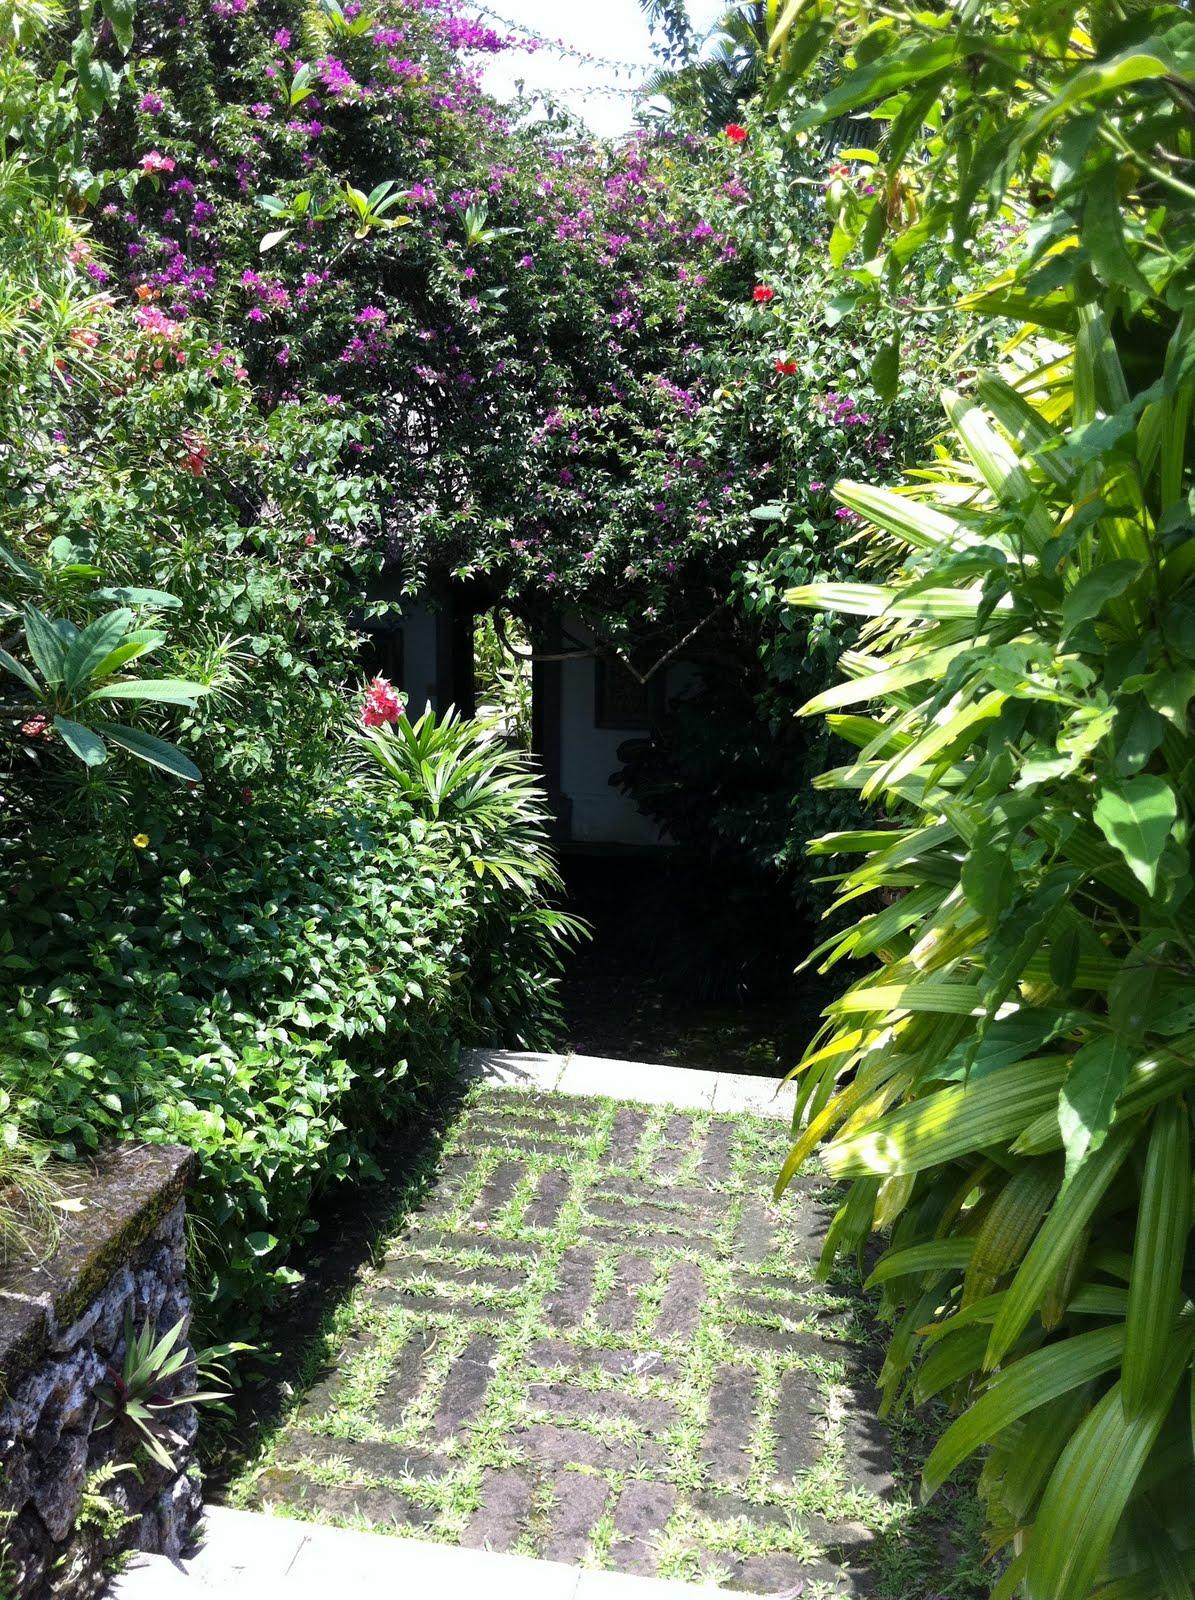 Pin by megan mathis on garden pinterest for Bali garden designs